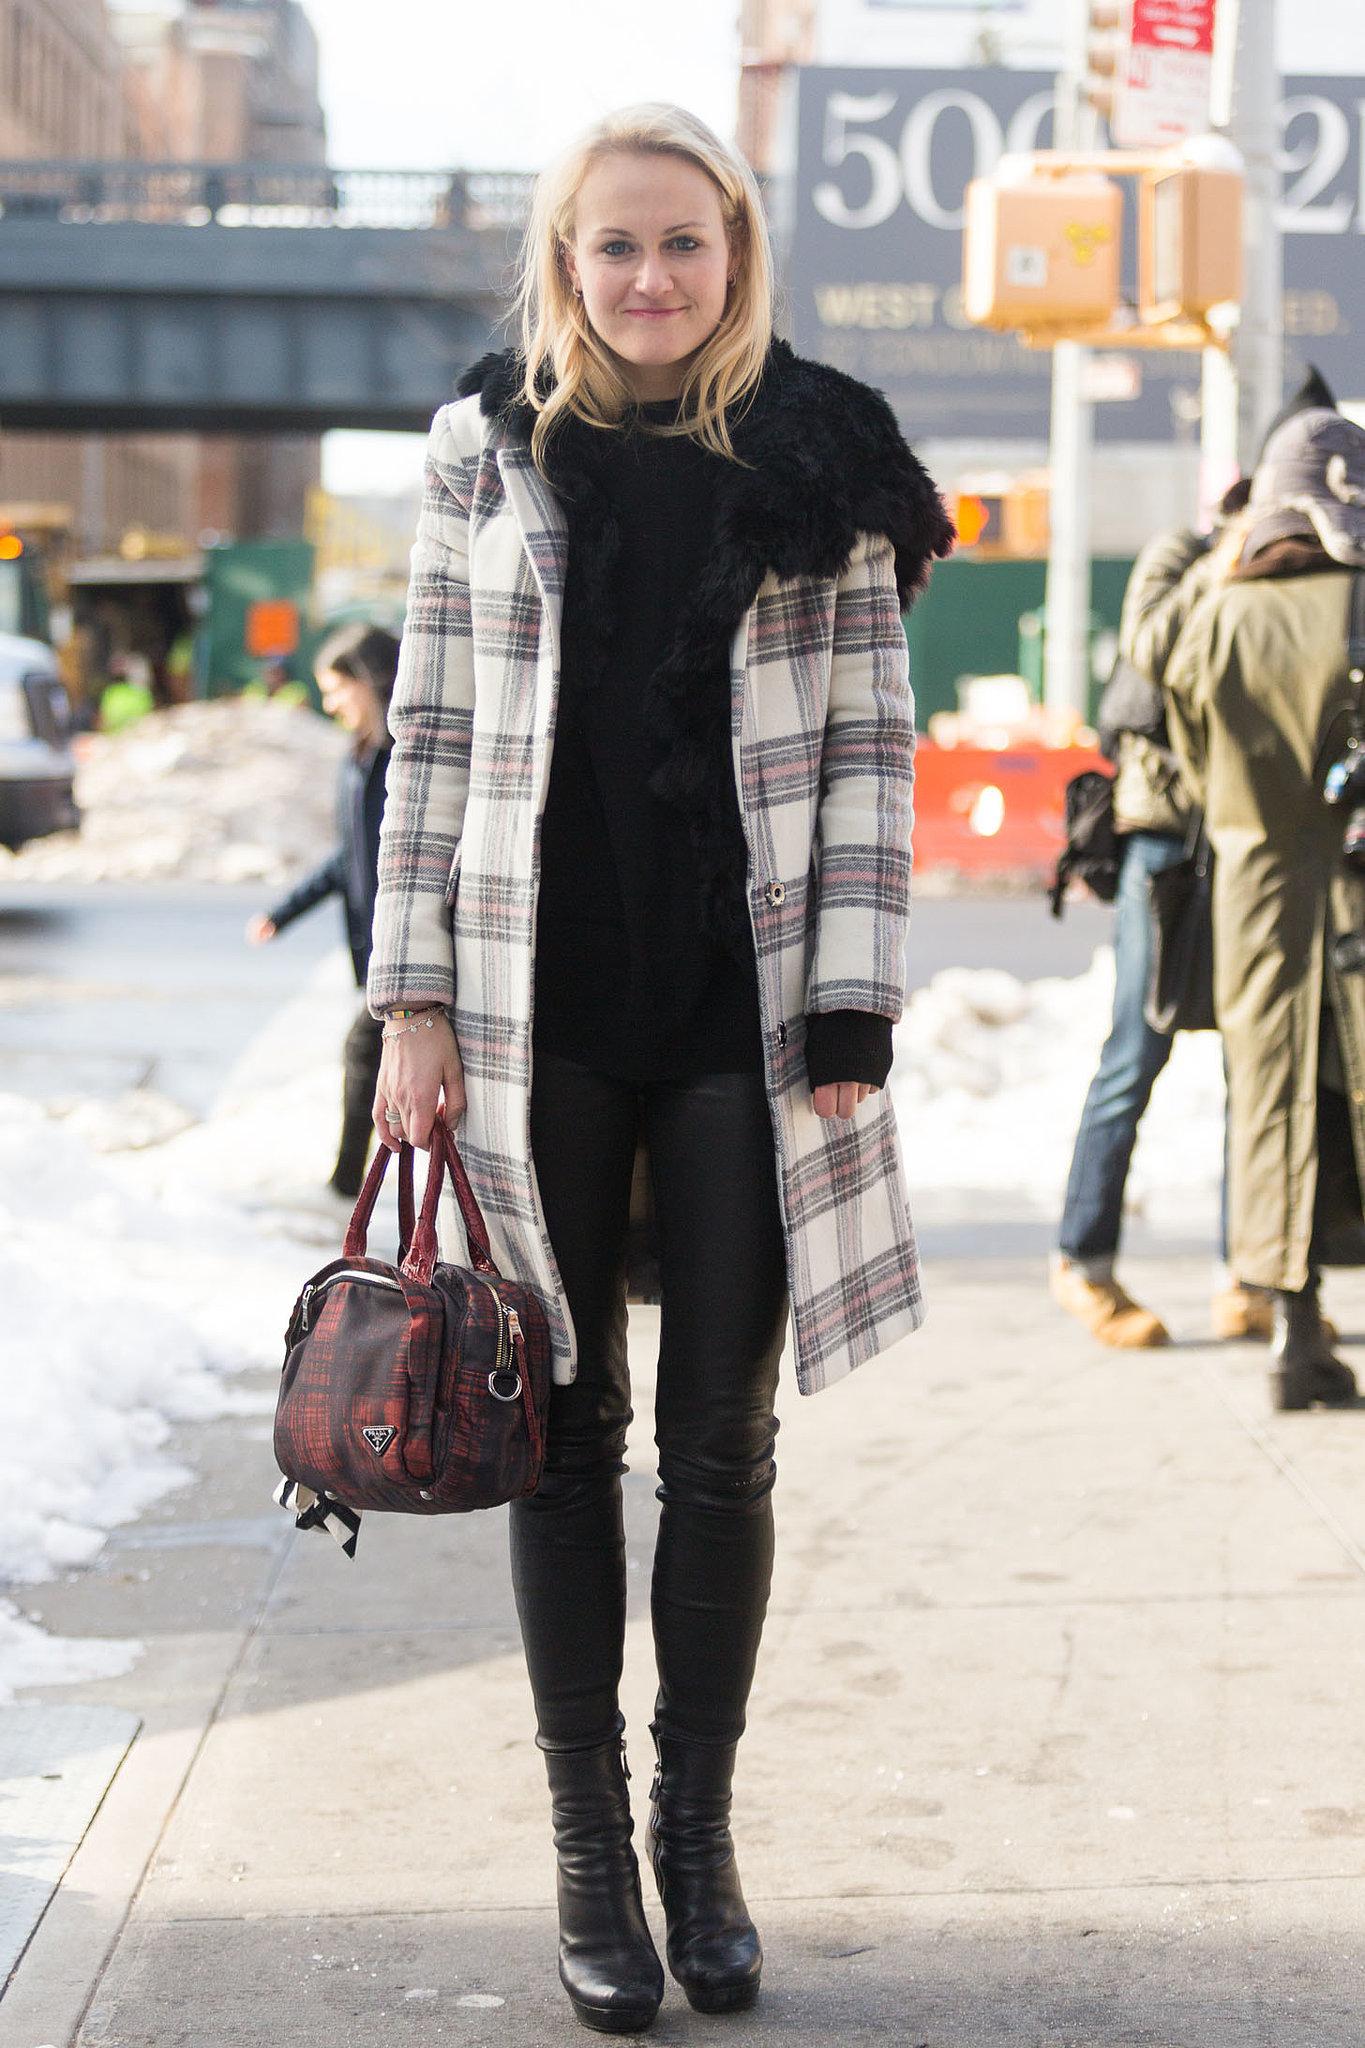 http://media1.onsugar.com/files/2014/02/07/662/n/1922564/9ba023f6ca4ec111_MJJ_0399.jpg.xxxlarge_2x/i/NYFW-Street-Style-Day-1.jpg